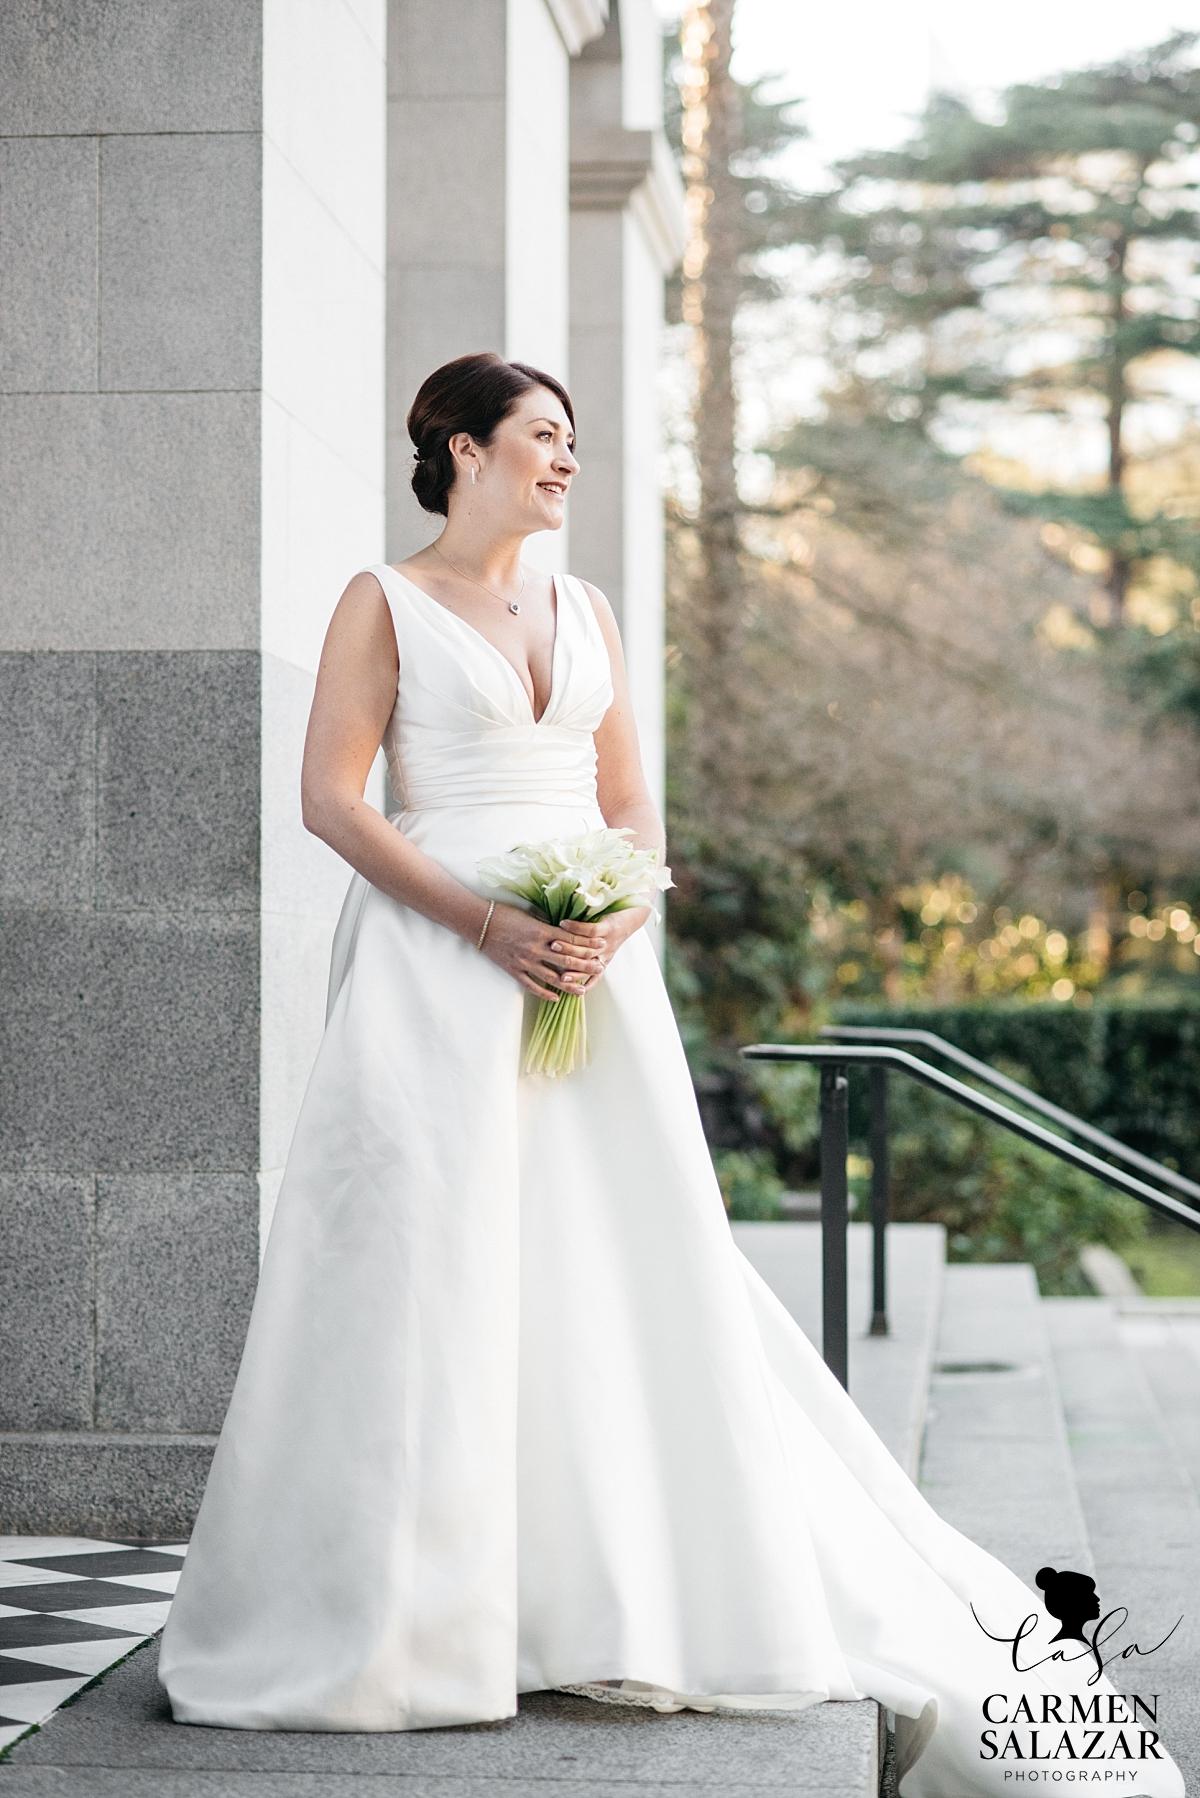 Beautiful bride on Capitol steps - Carmen Salazar